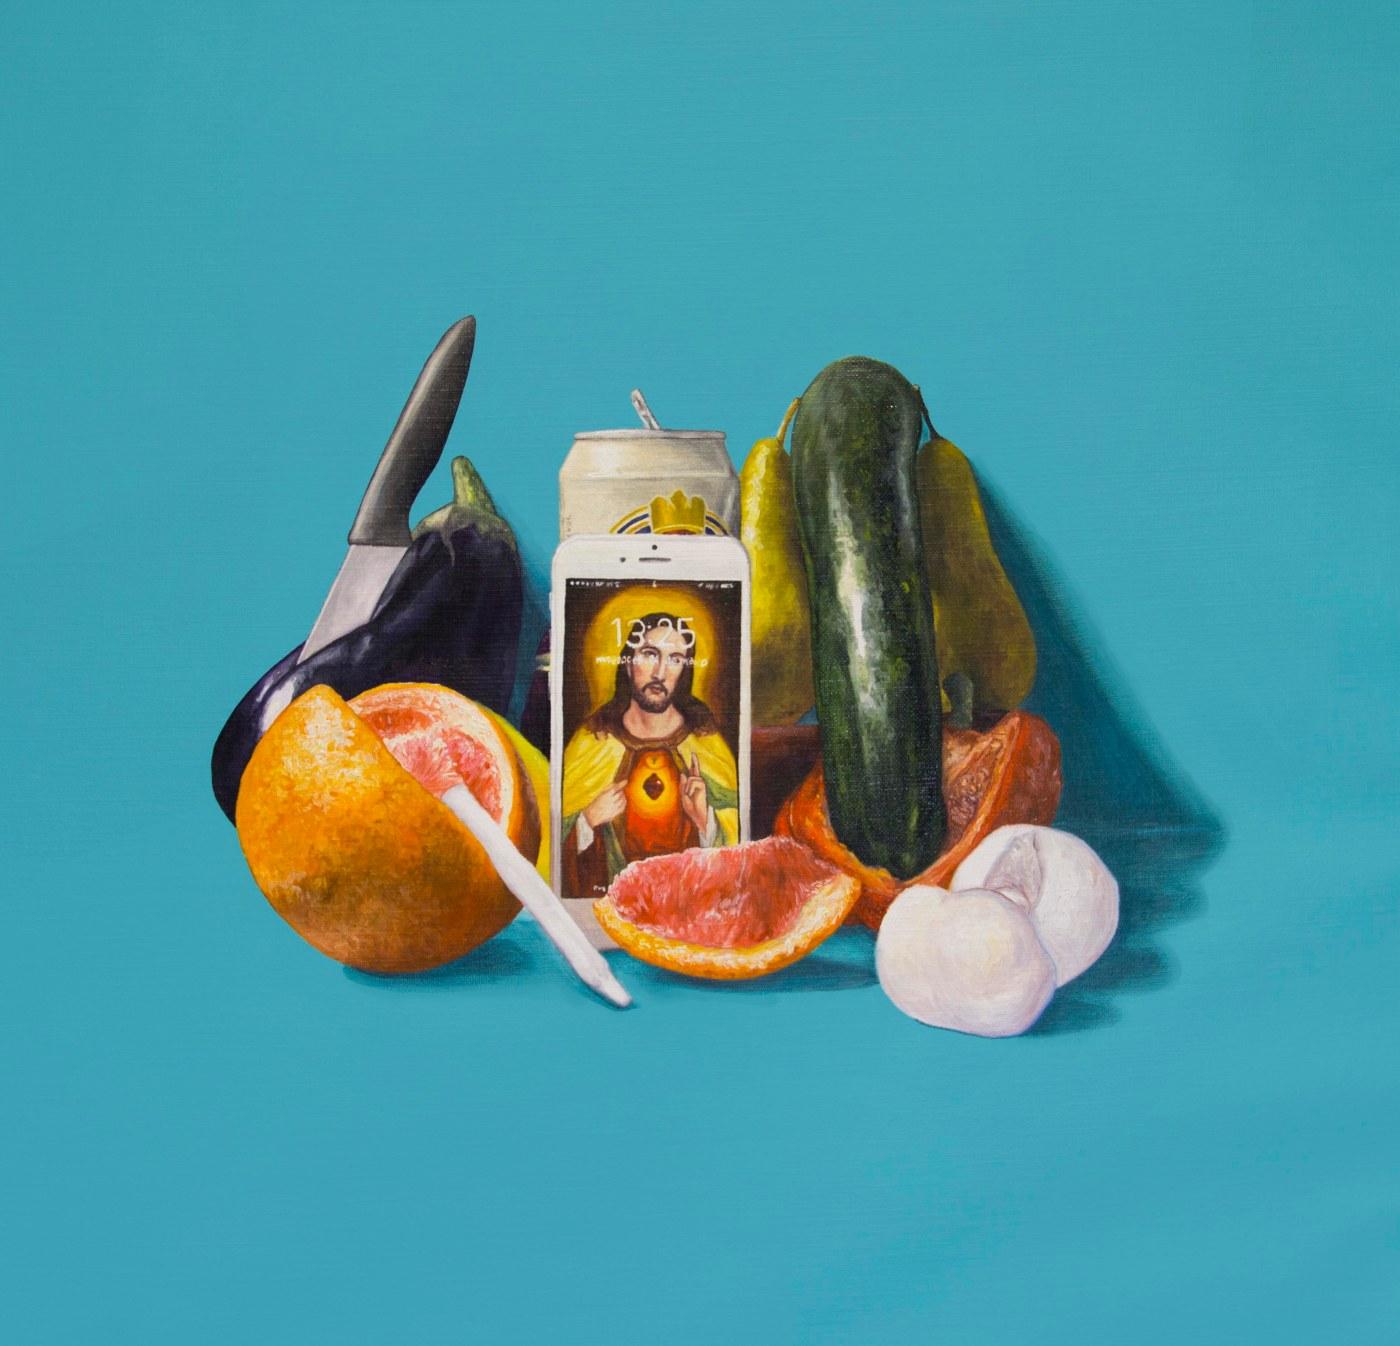 Naturaleza muerta contemporanea III oil painting - acrylic painting